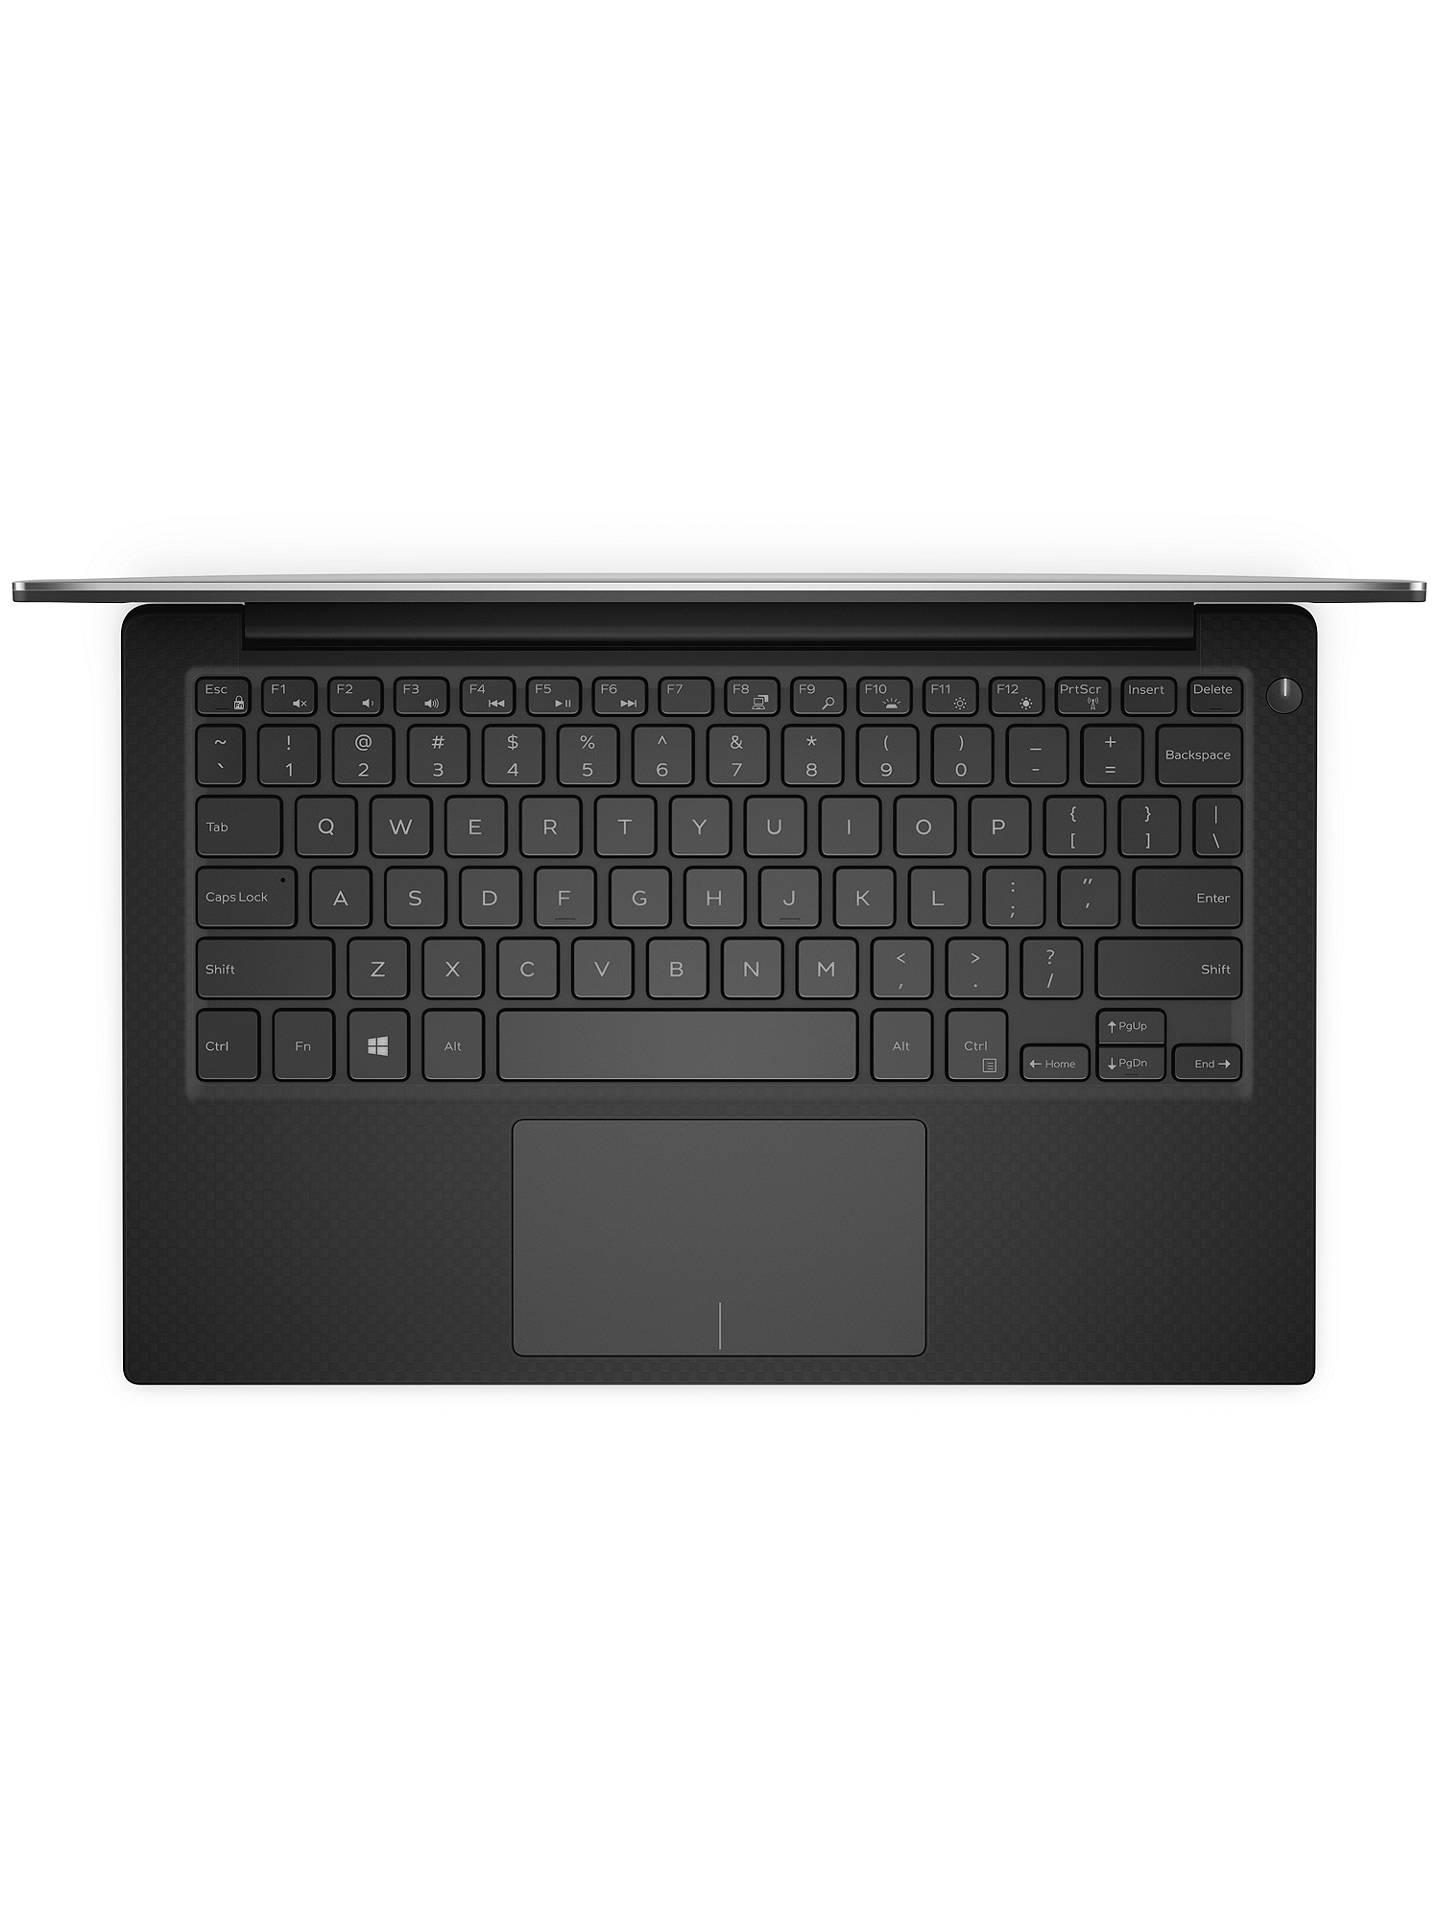 Dell XPS 13 Notebook, Intel Core i7, 16GB RAM, 512GB, 13